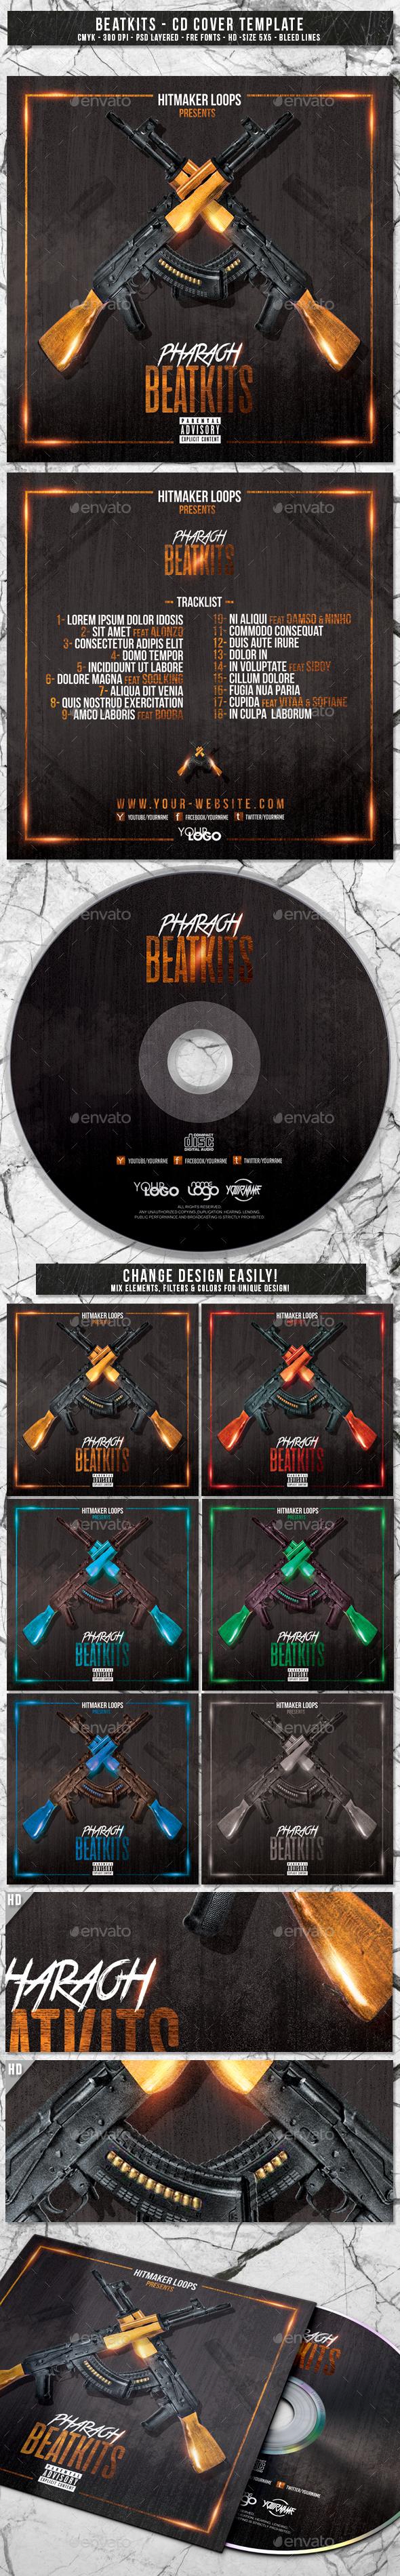 Beatkits | Album CD Mixtape Cover Template - CD & DVD Artwork Print Templates